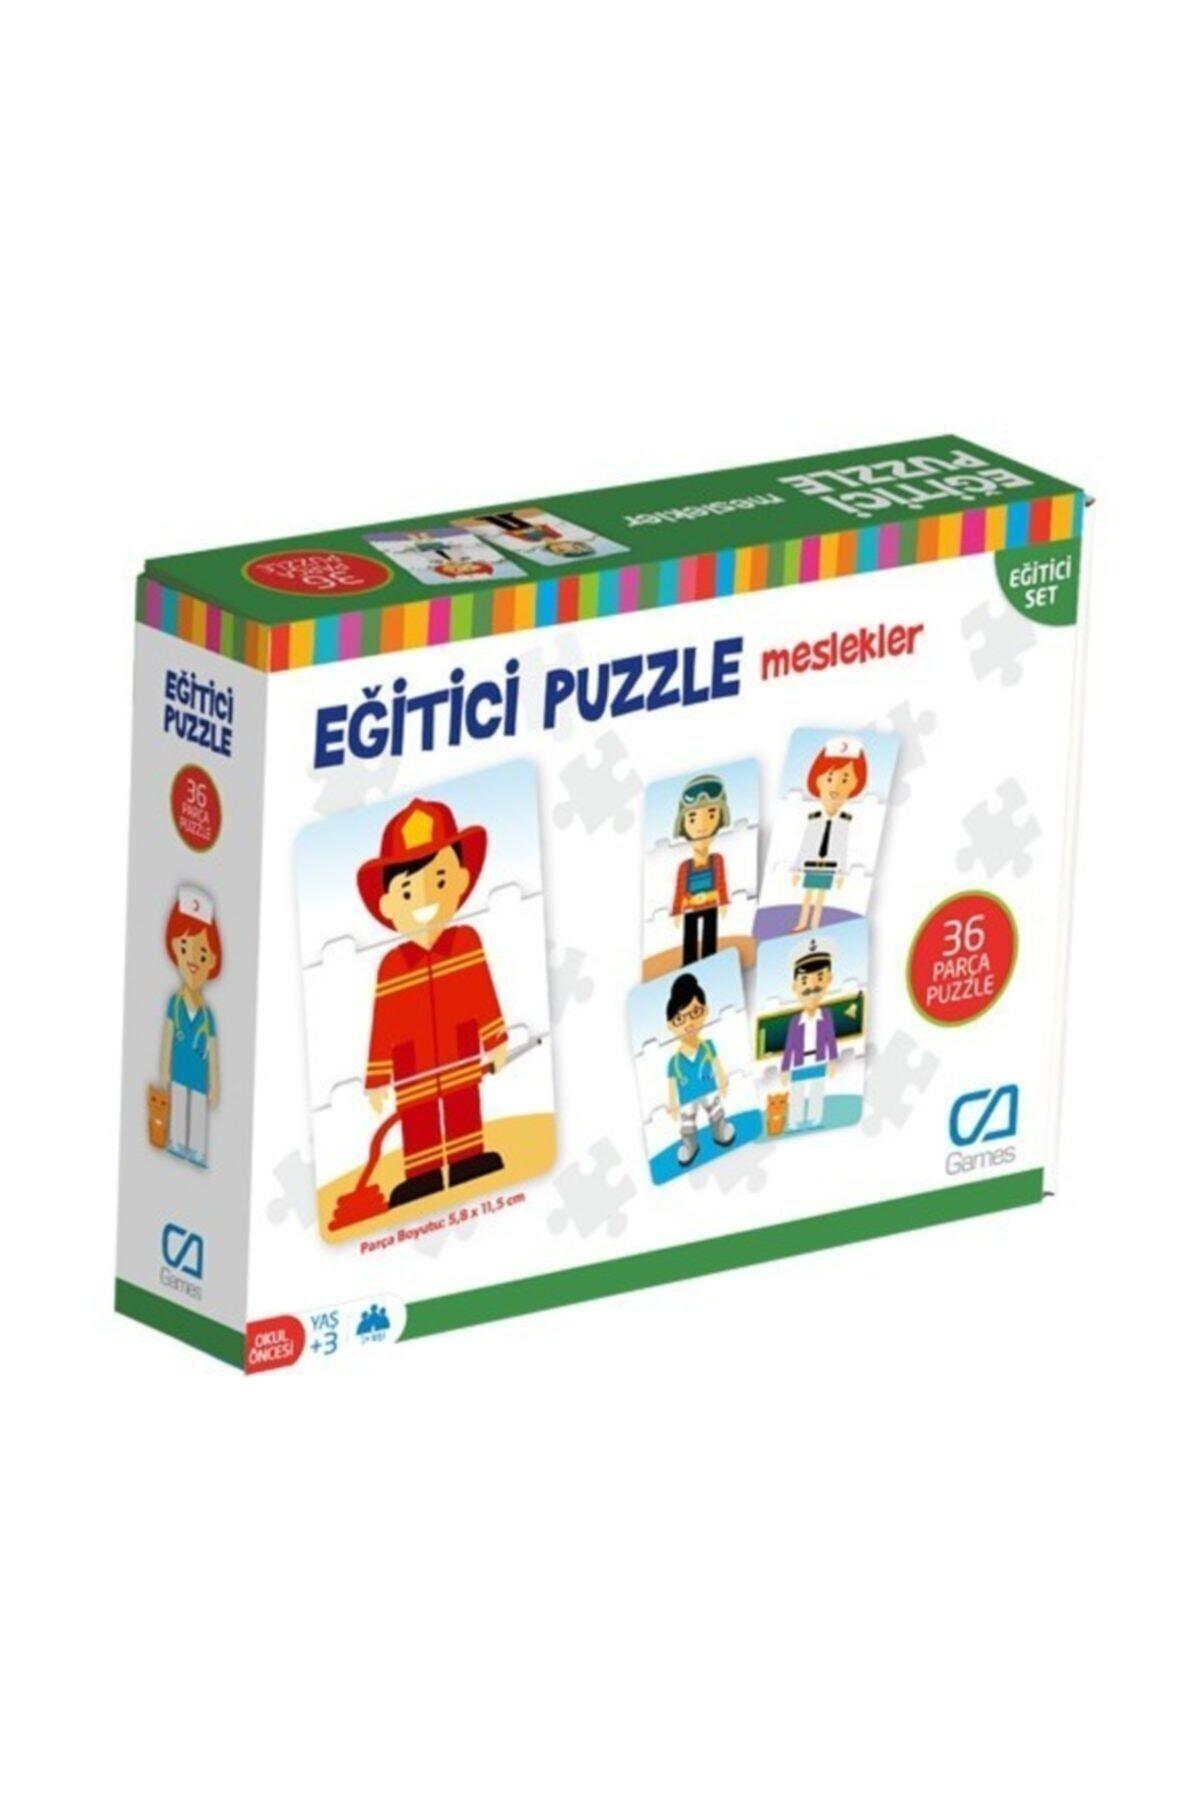 CA Games Meslekler - Eğitici Puzzle - Null 1